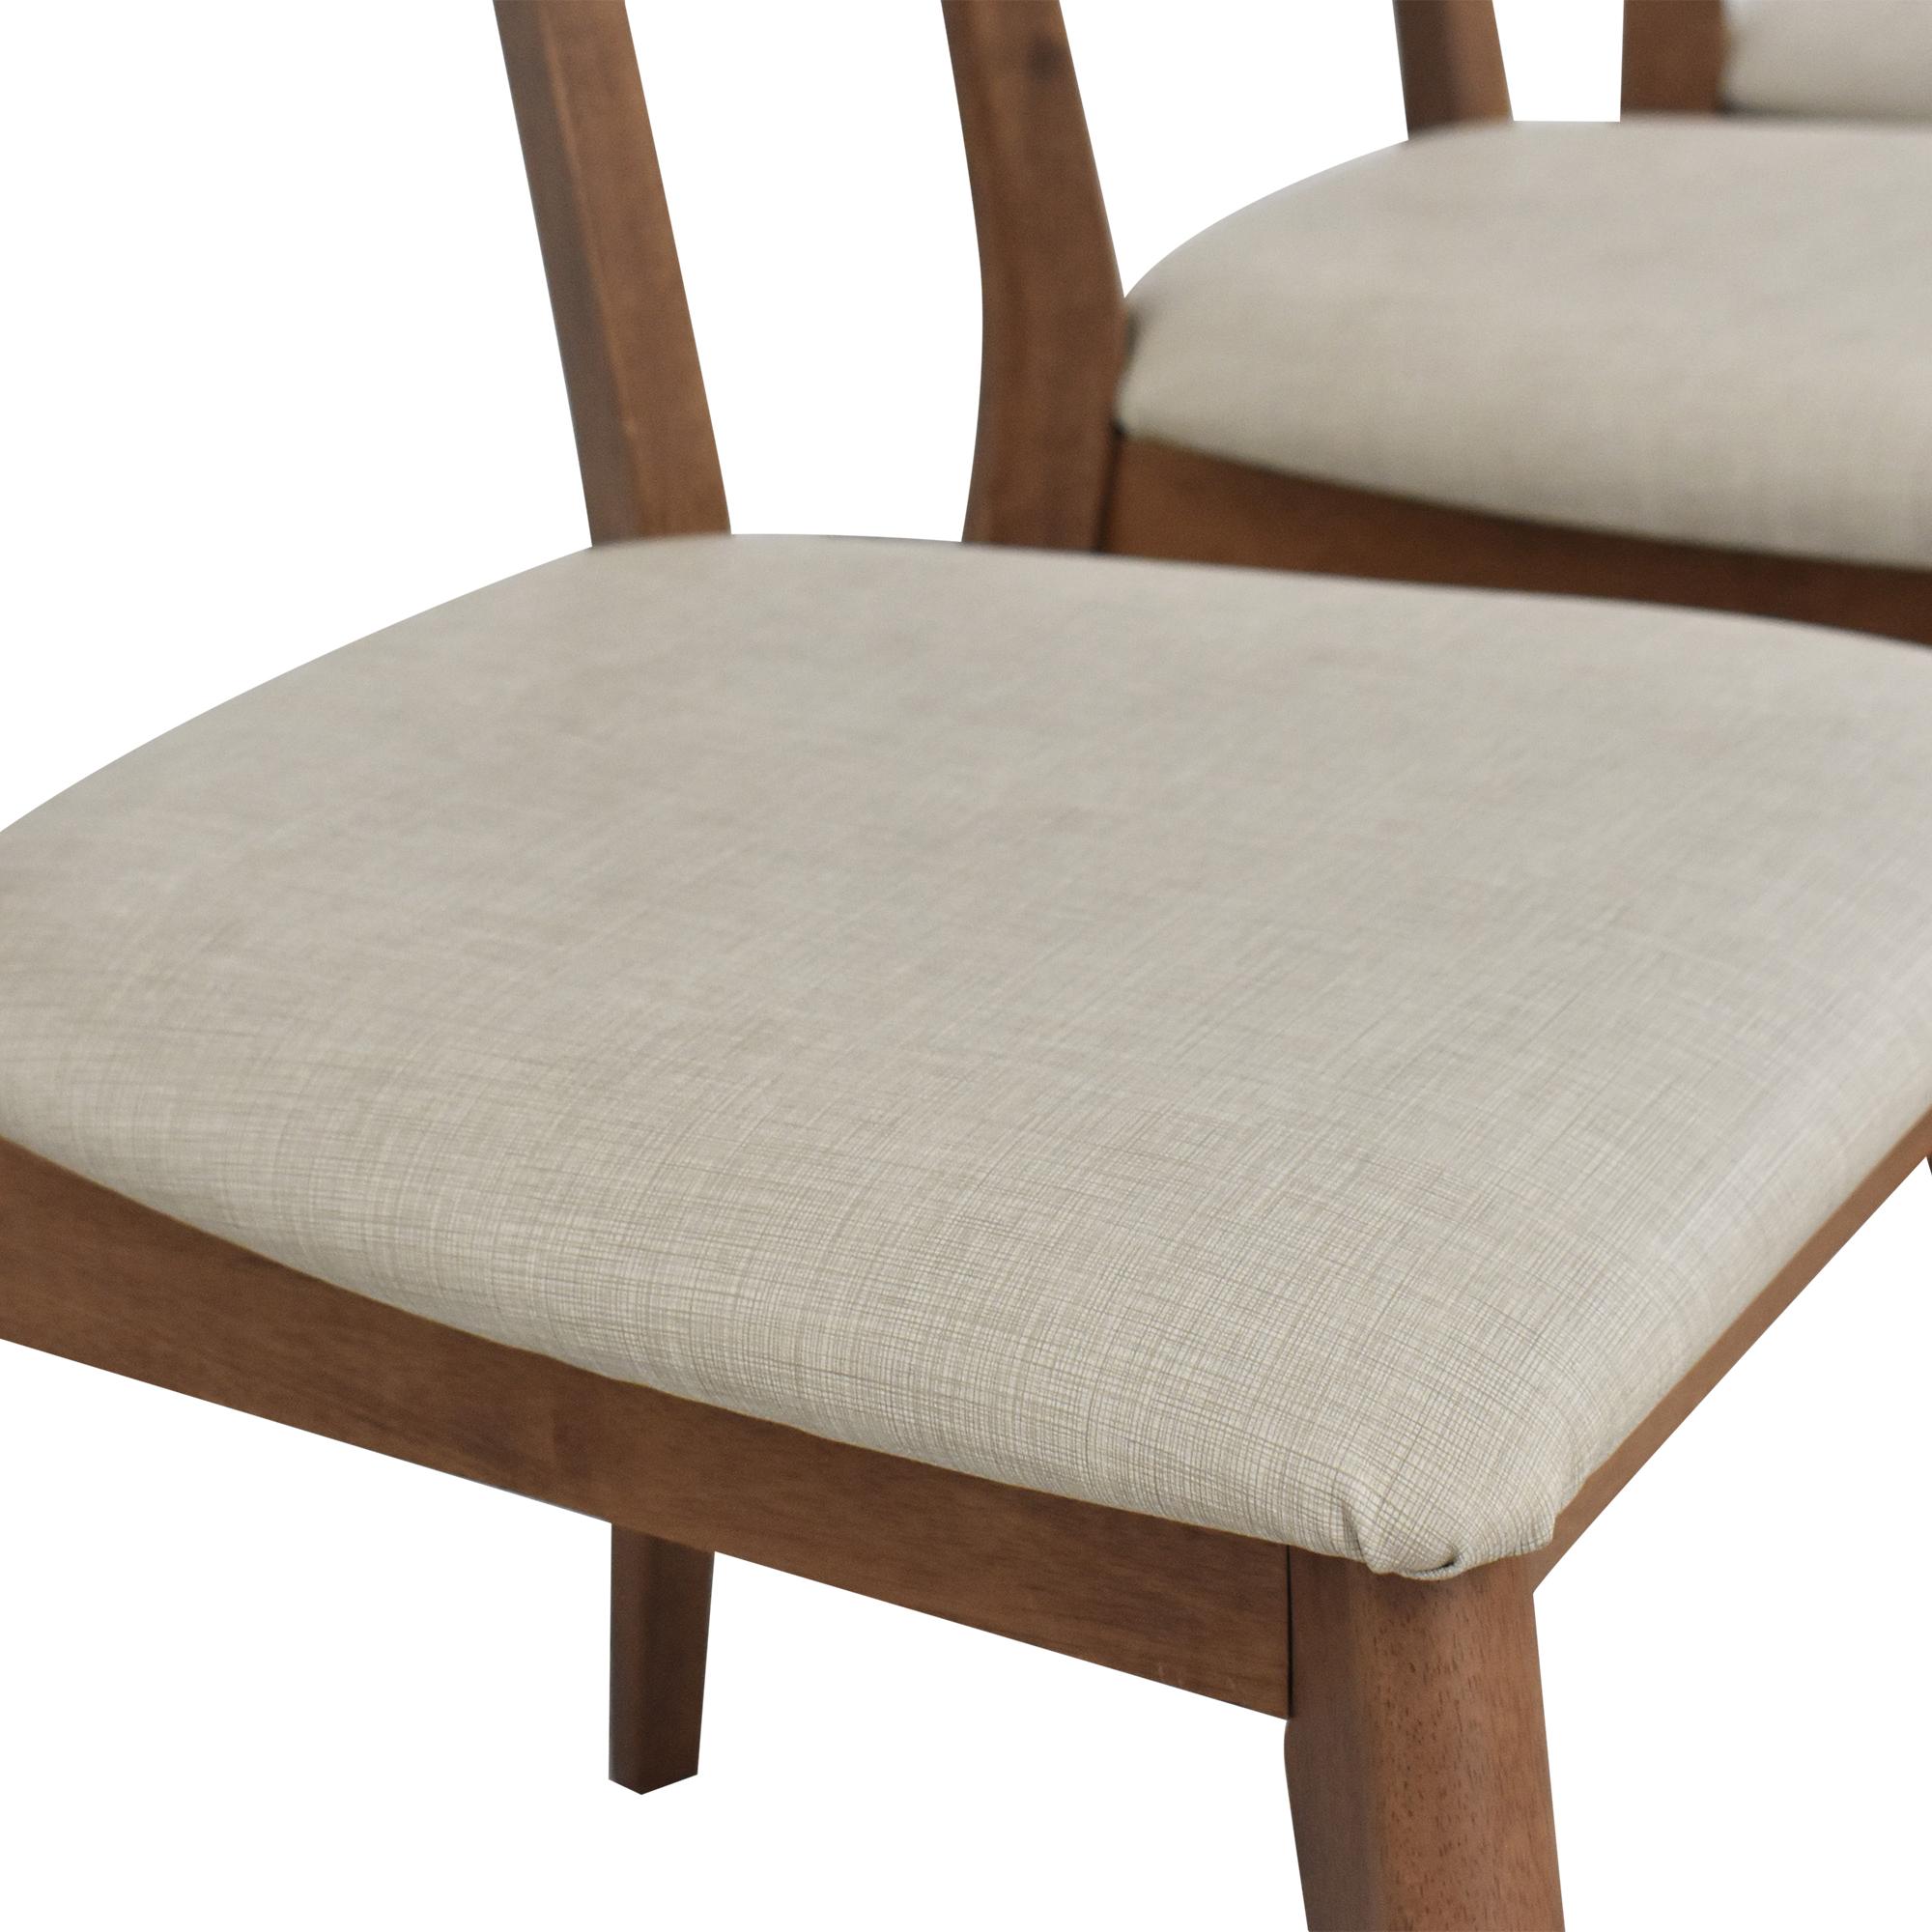 AllModern AllModern Mid-Century Modern Style Dining Chairs nj